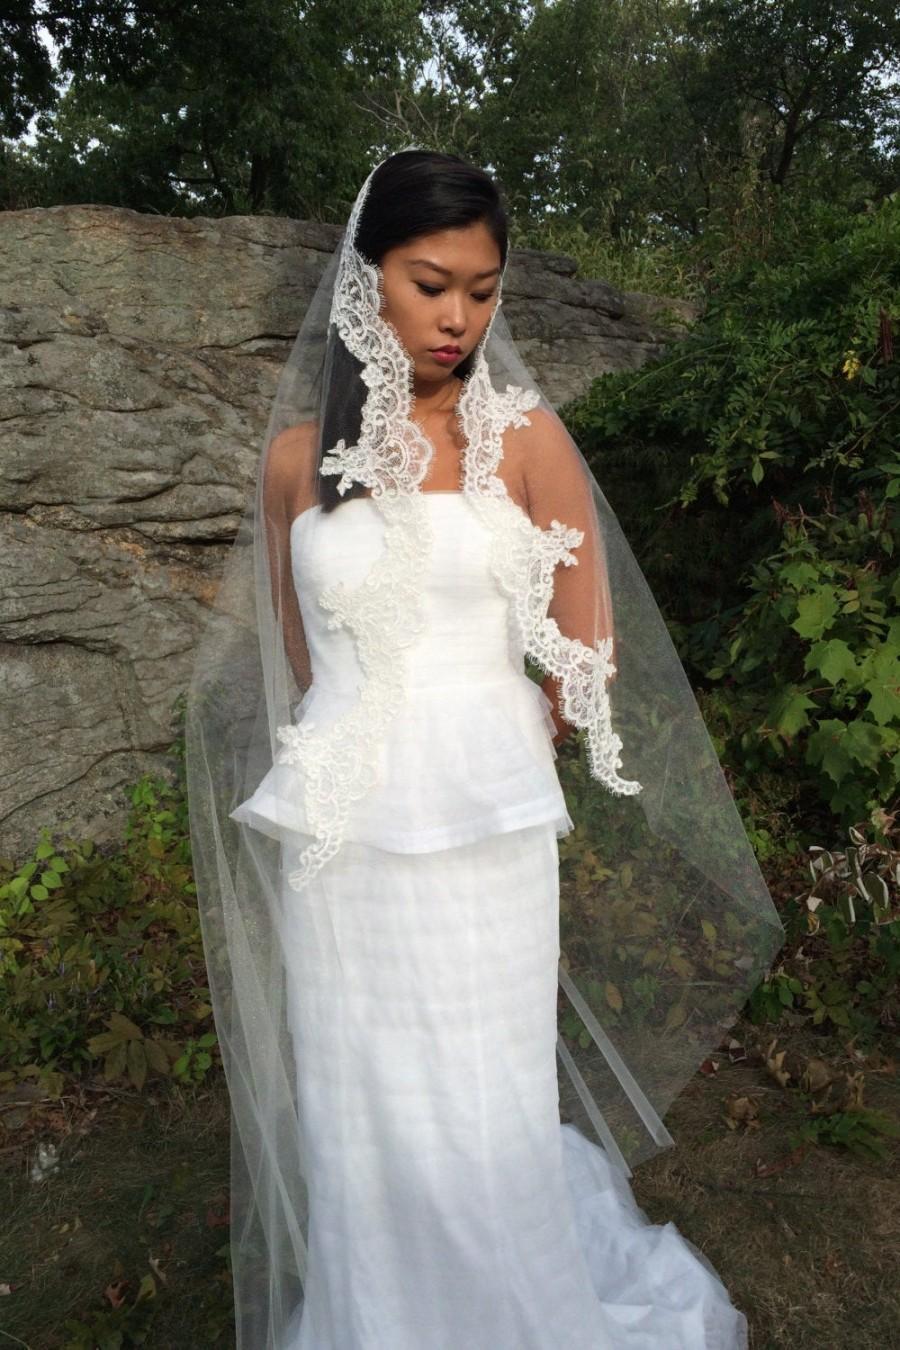 Hochzeit - Mantilla Veil, Lace Veil Made to Order, Lace Wedding Veil, Alencon Lace Veil